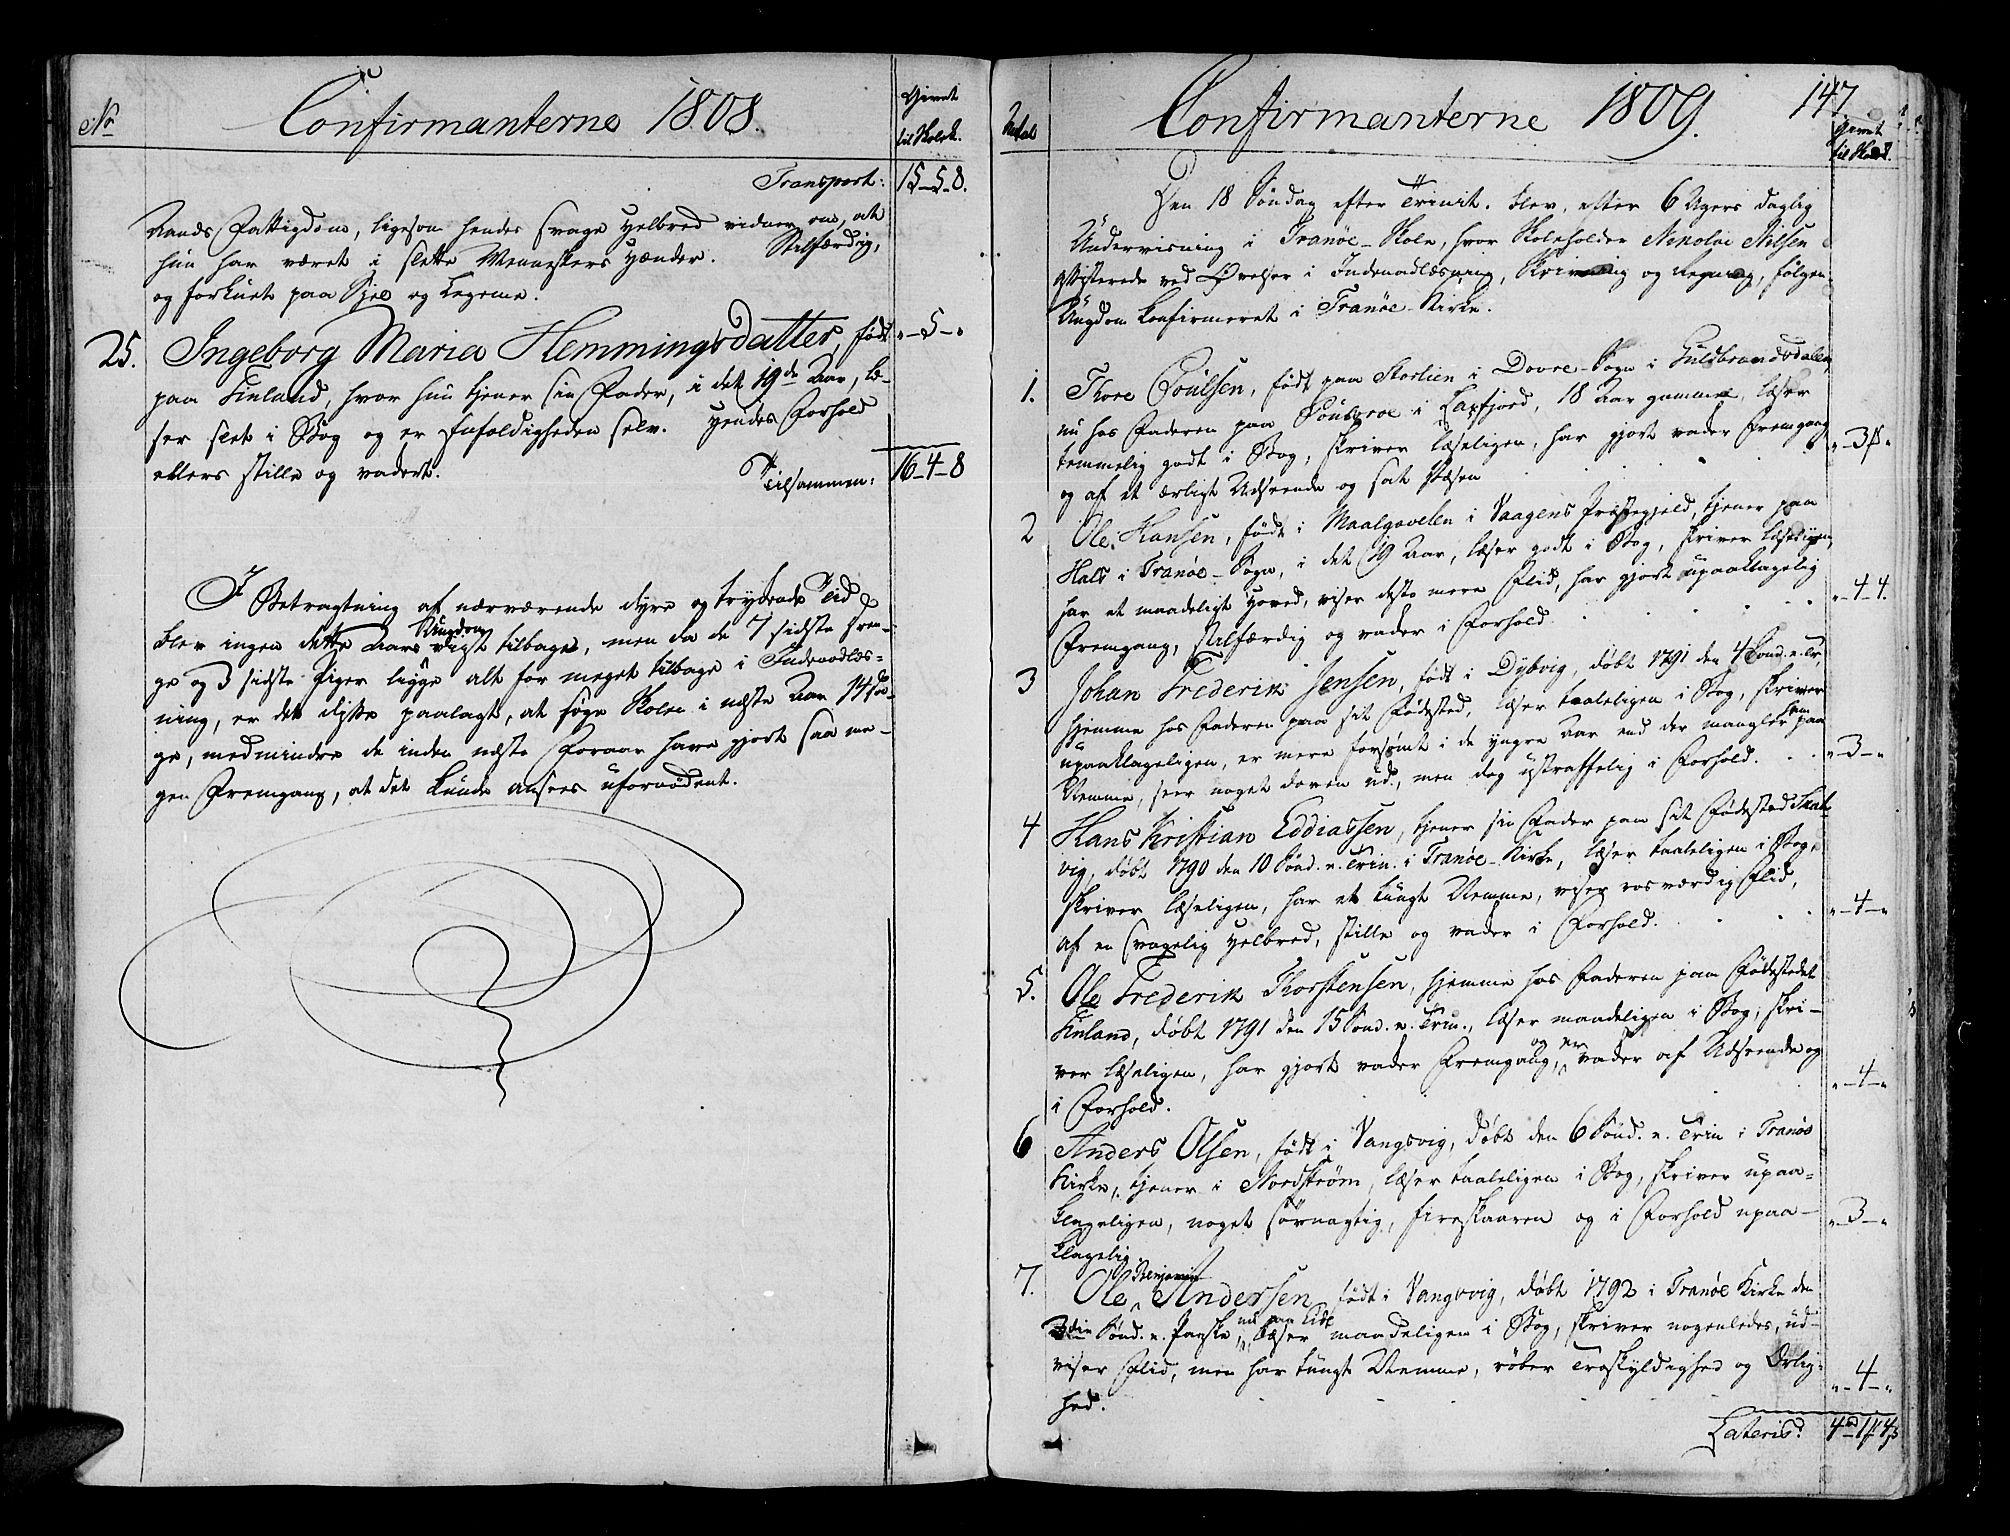 SATØ, Tranøy sokneprestkontor, I/Ia/Iaa/L0003kirke: Ministerialbok nr. 3, 1807-1820, s. 147